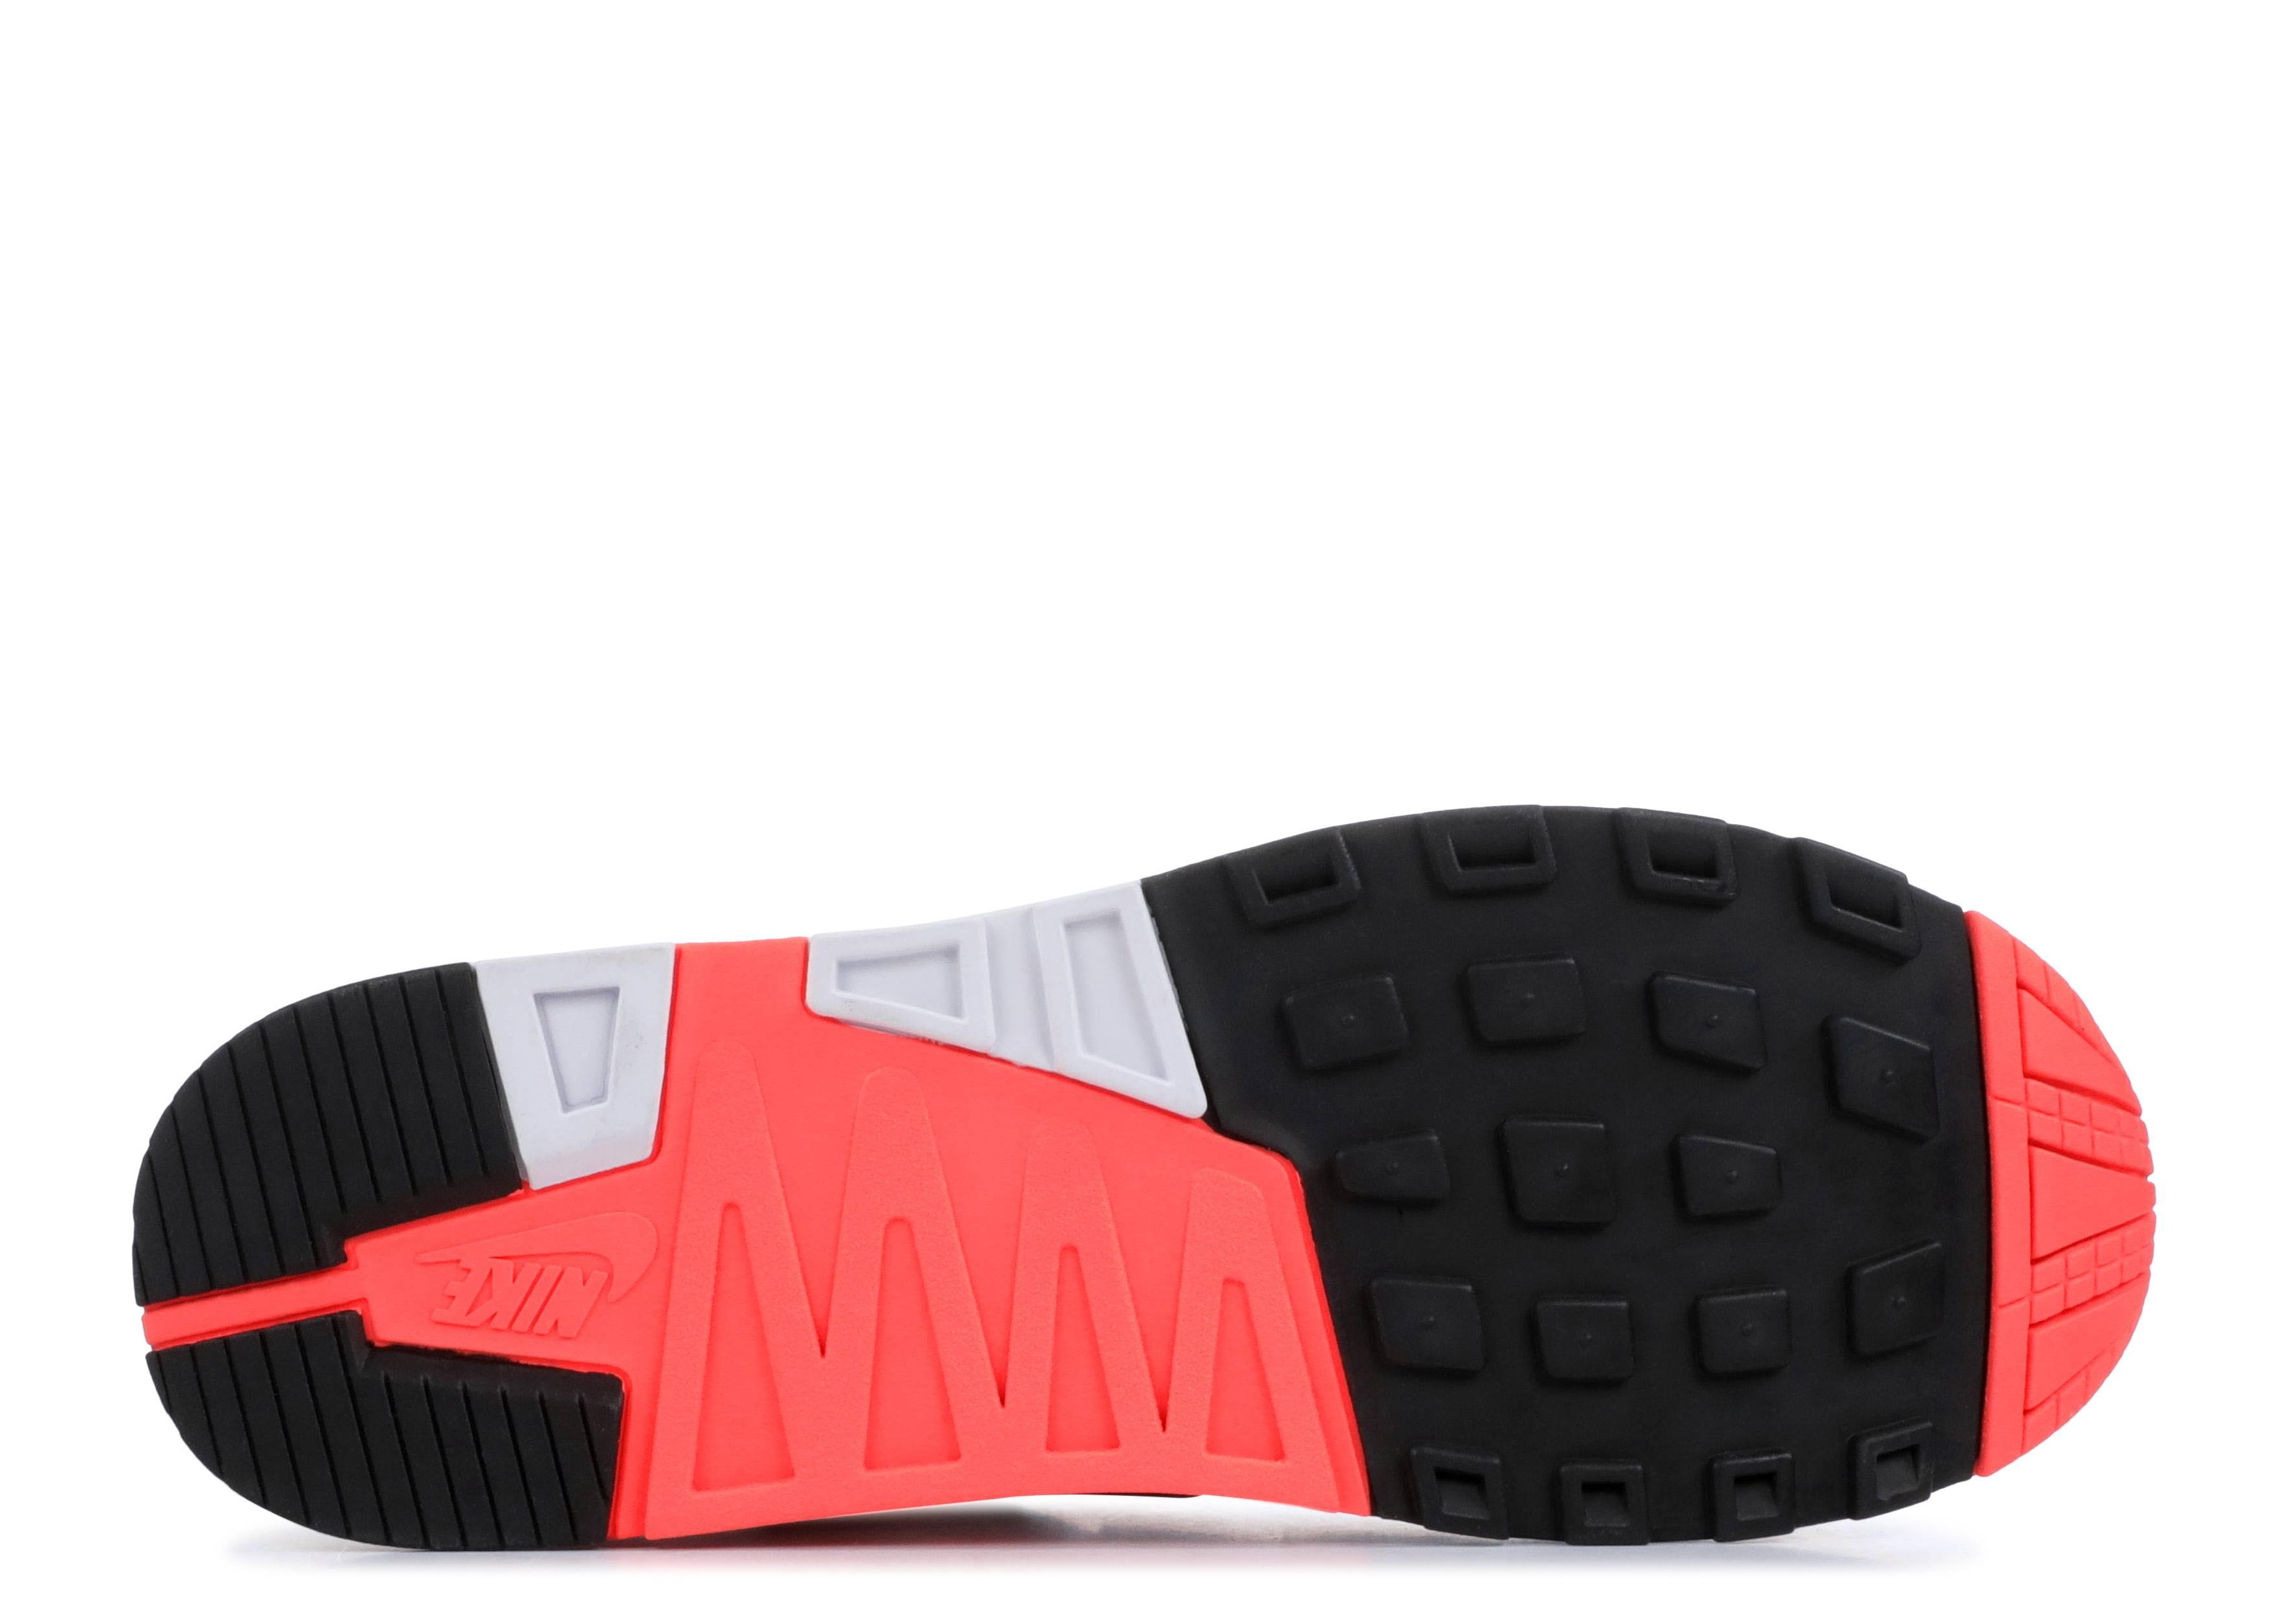 833a18f28e1e Nike Air Stab - Nike - 312451 101 - white  black hot lava